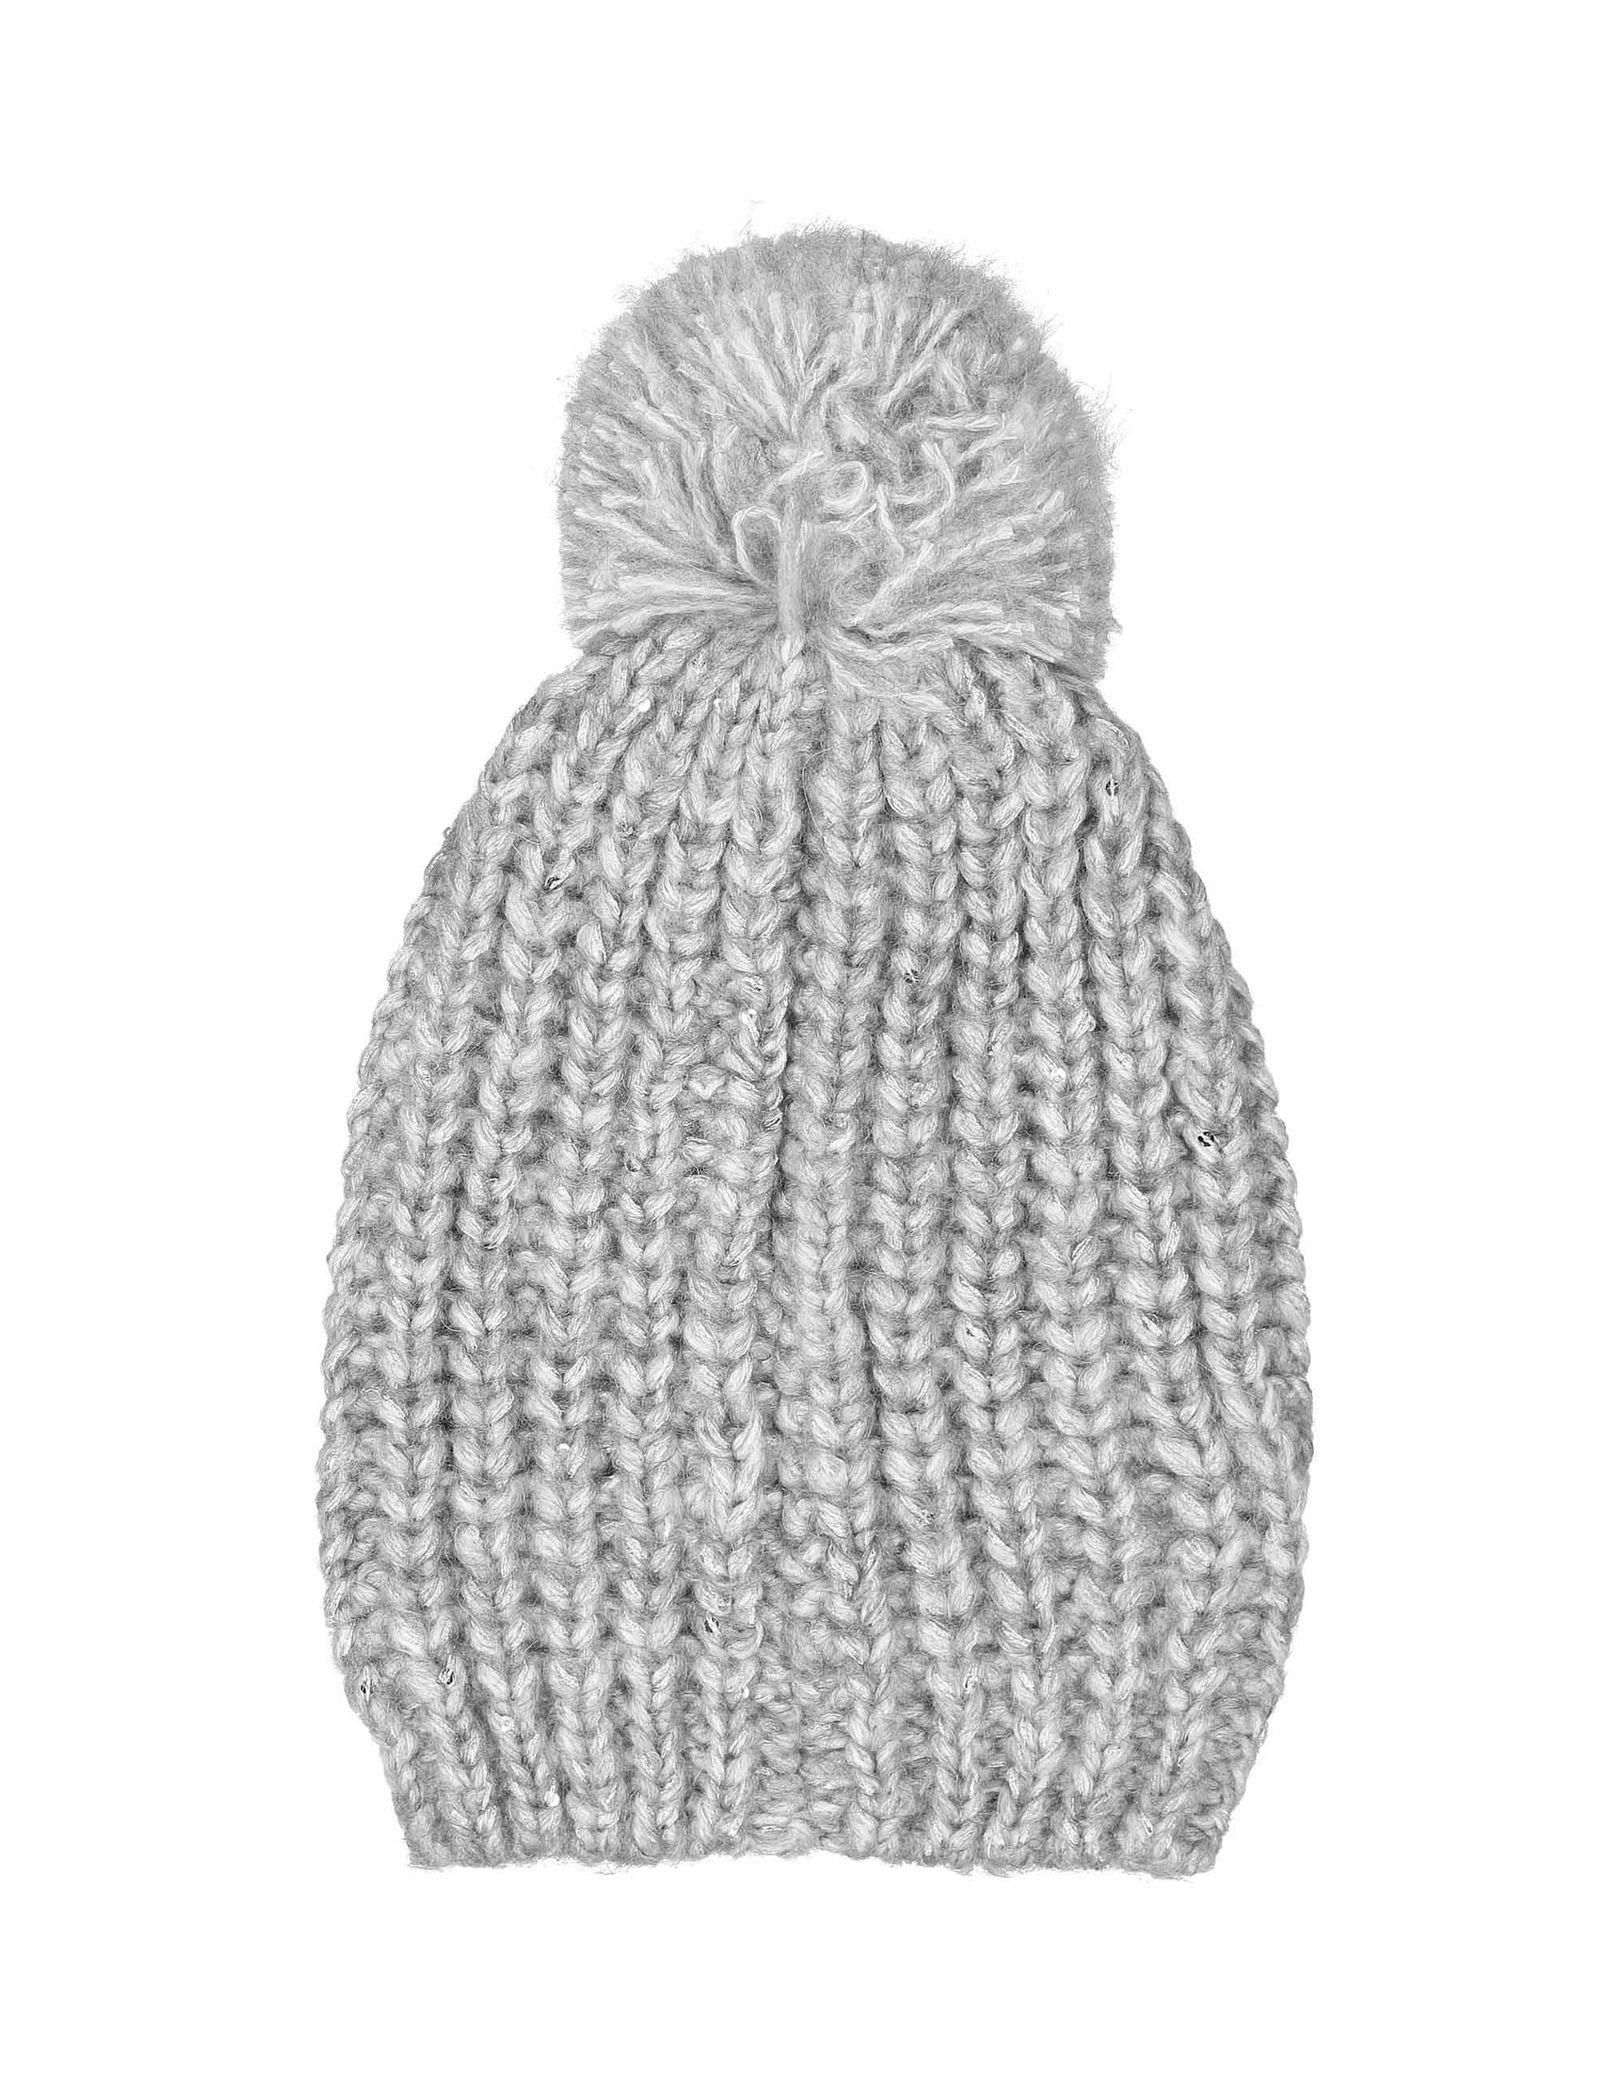 کلاه بافتنی نوزادی دخترانه - ایدکس - طوسي - 2